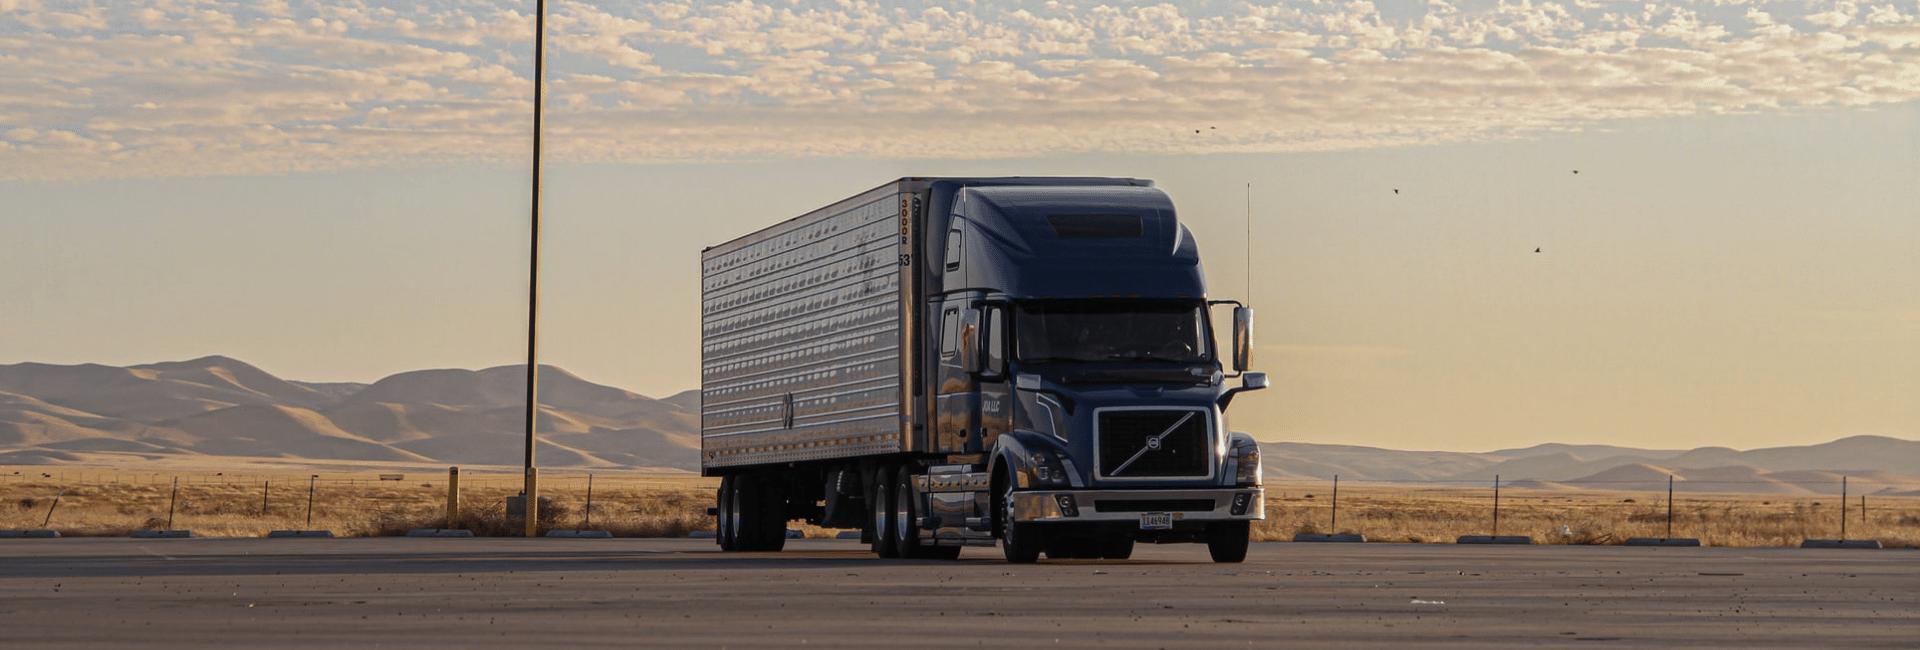 Semi truck in a parking lot